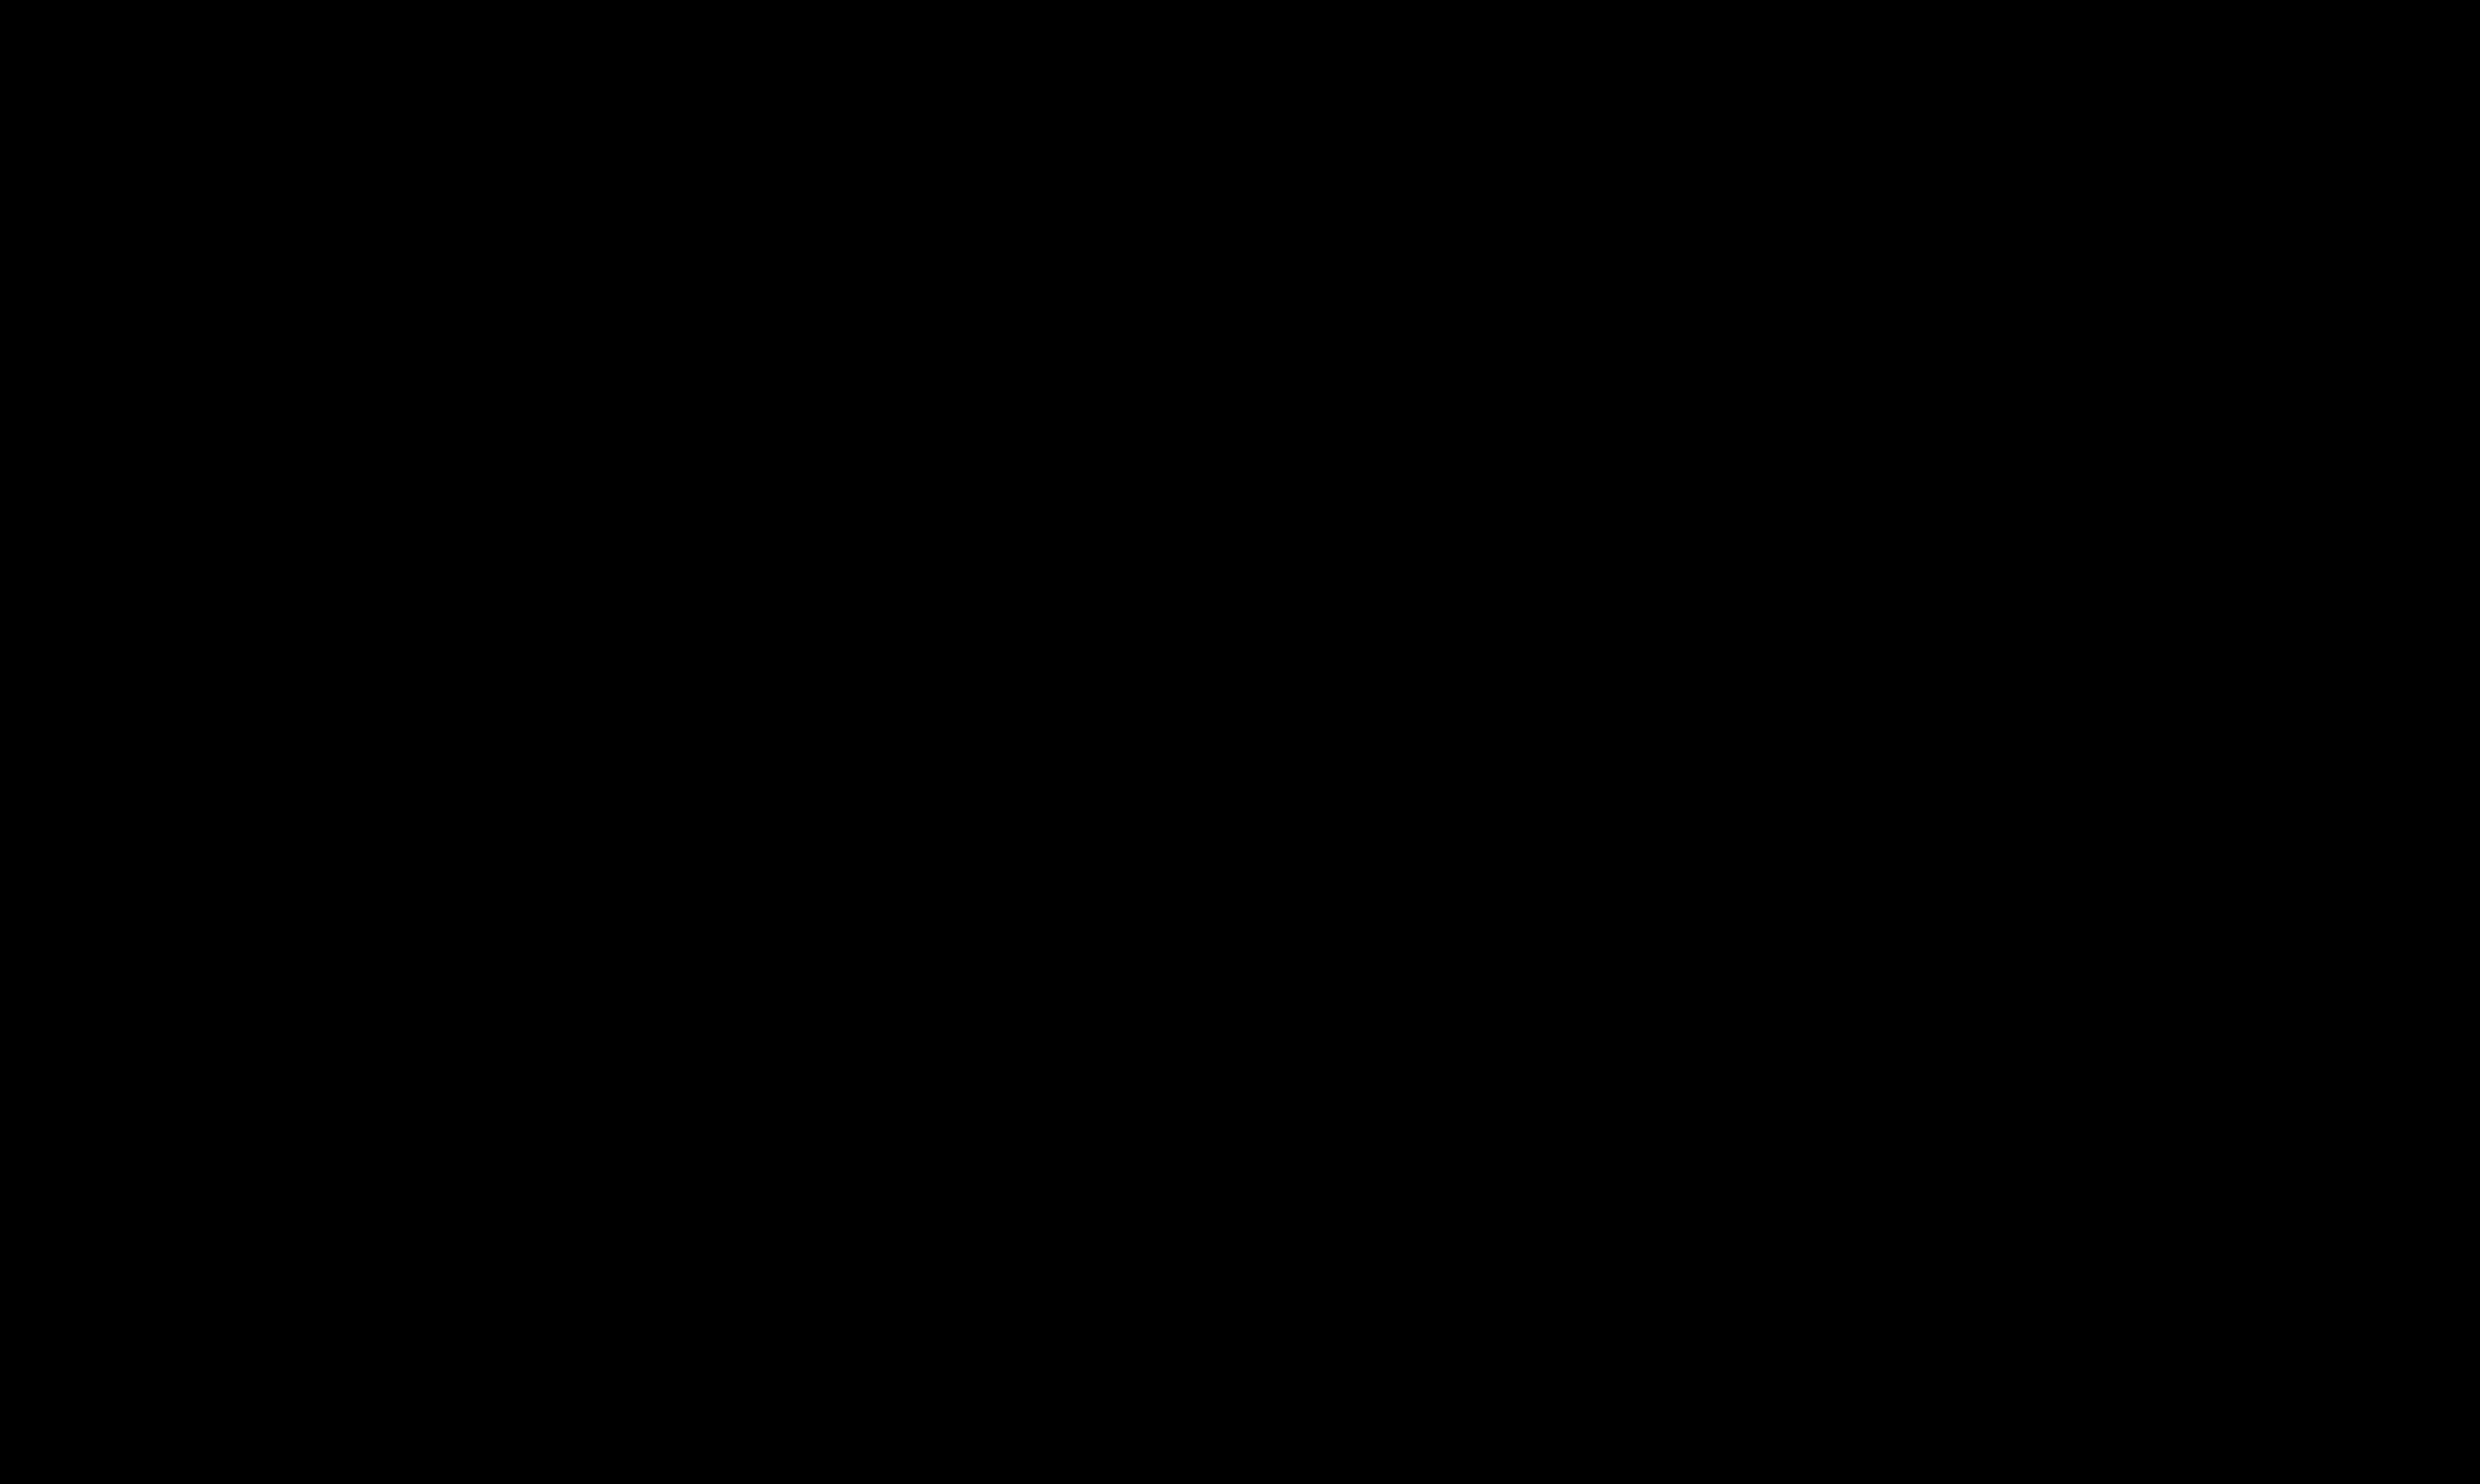 Hard_Rock_Hotel_logo.png